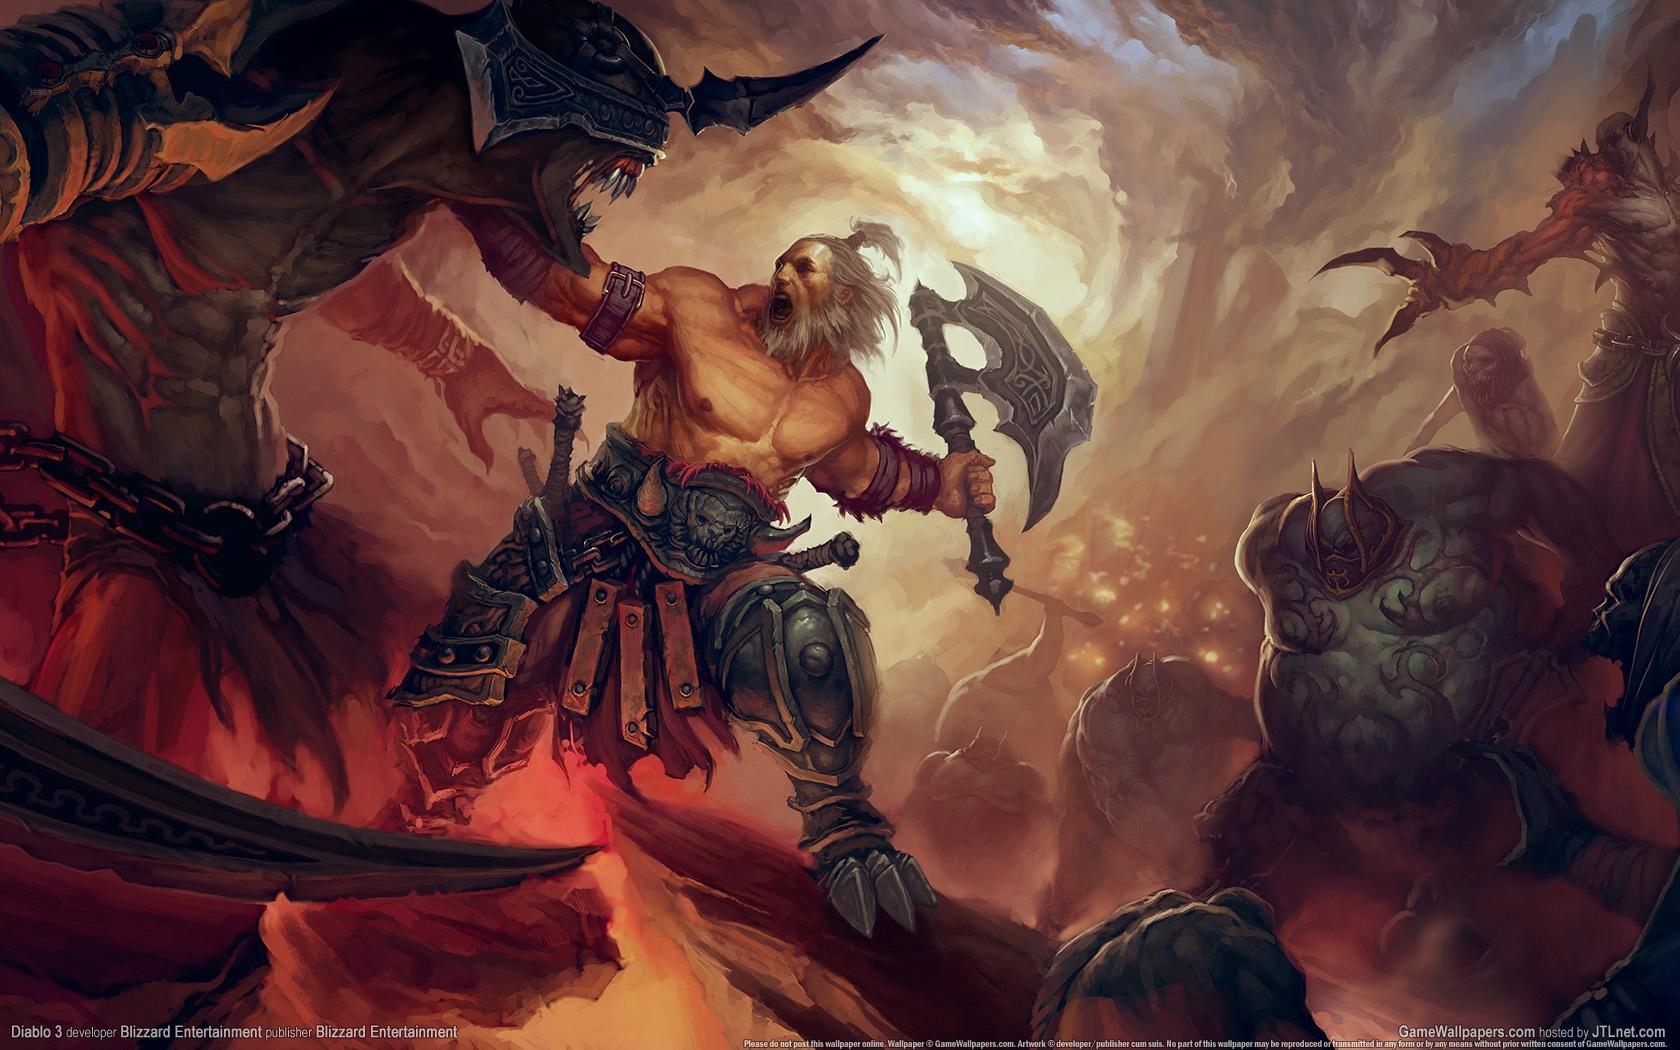 Diablo 3 The Barbarian Hd Wallpaper 1680x1050